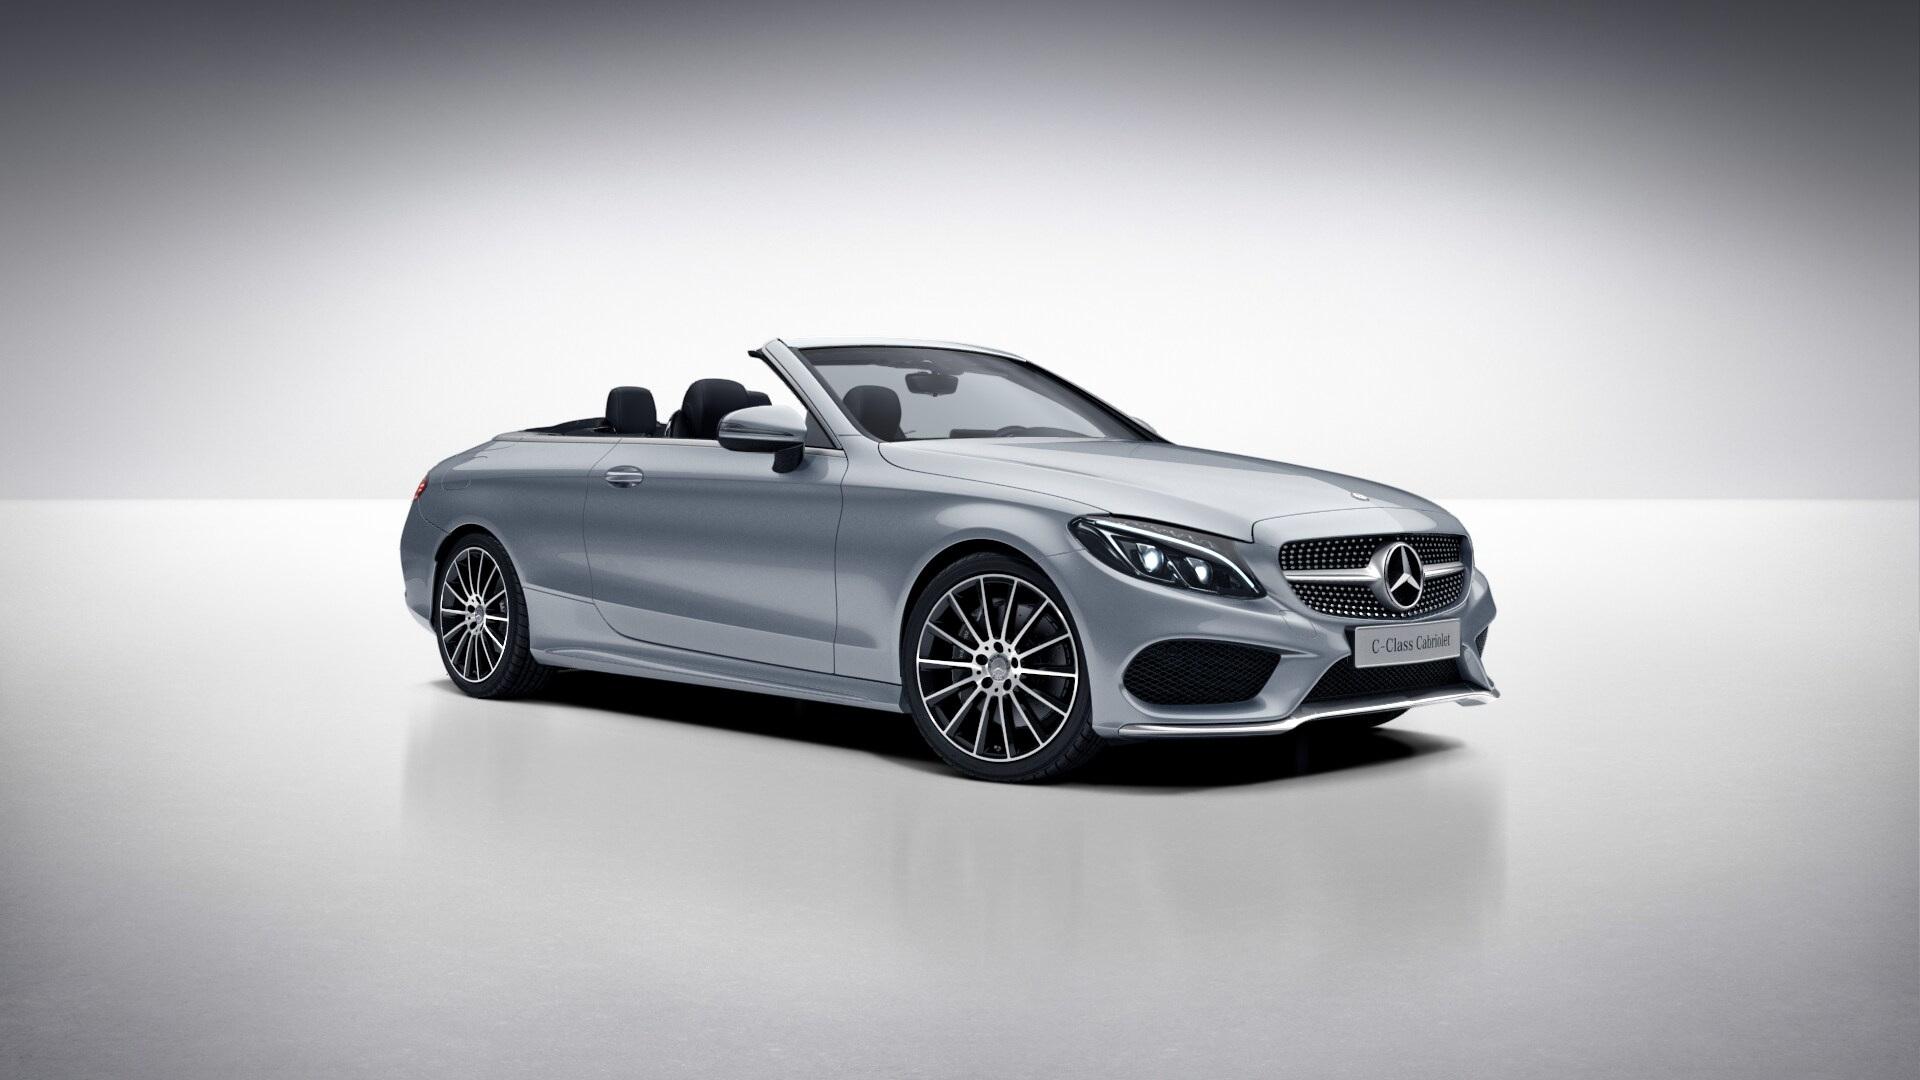 C class cabriolet mercedes benz vancouver retail group for Mercedes benz vancouver